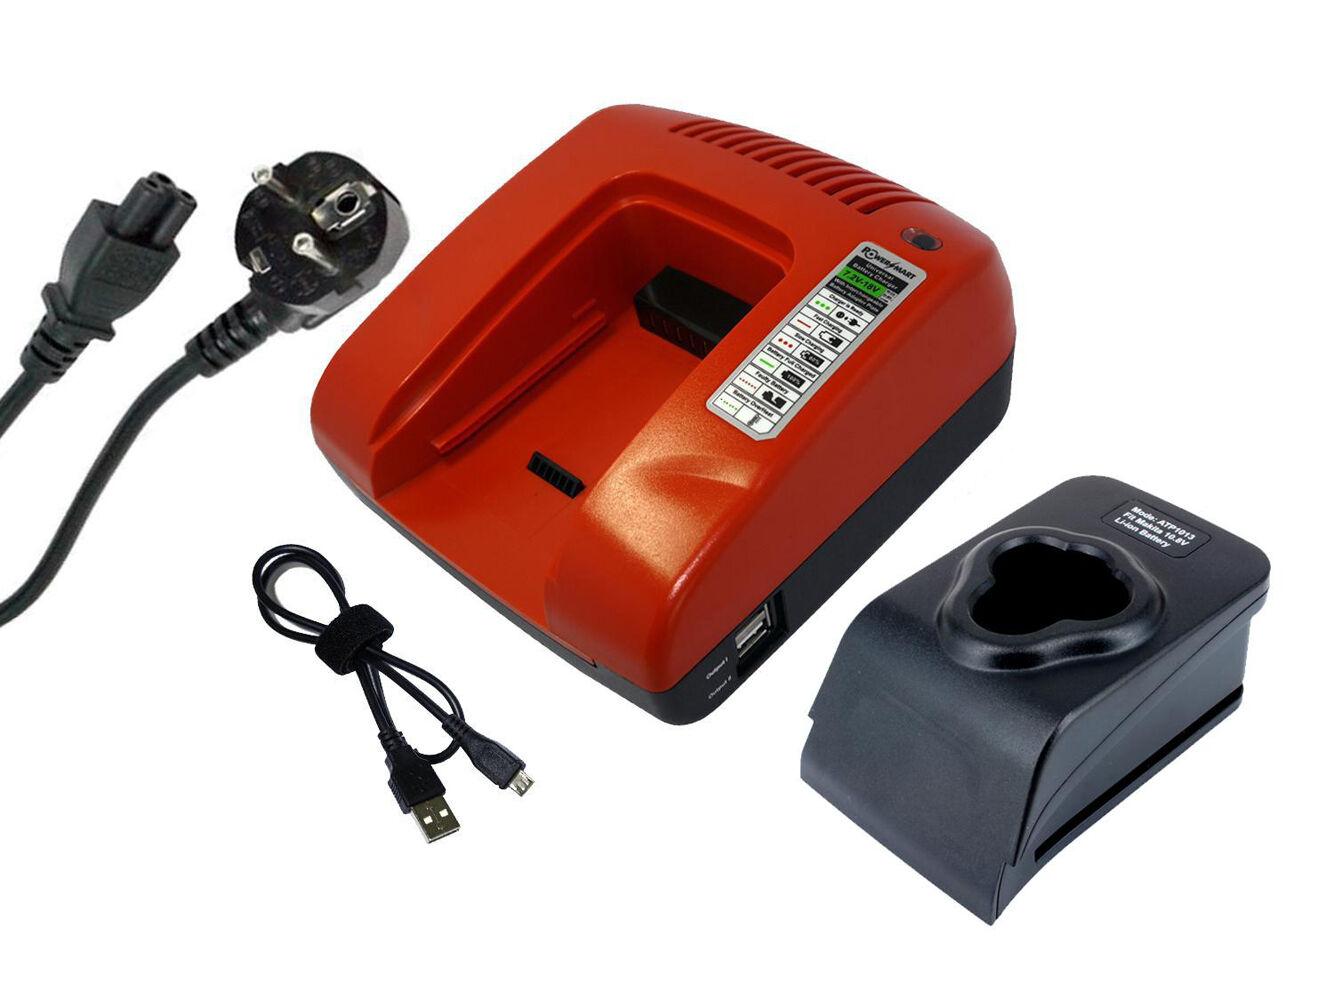 10.8V Ladegerät für Makita DC10WA CC300DW CC300DZ CL100DW CL100DZ CL102D, Rot